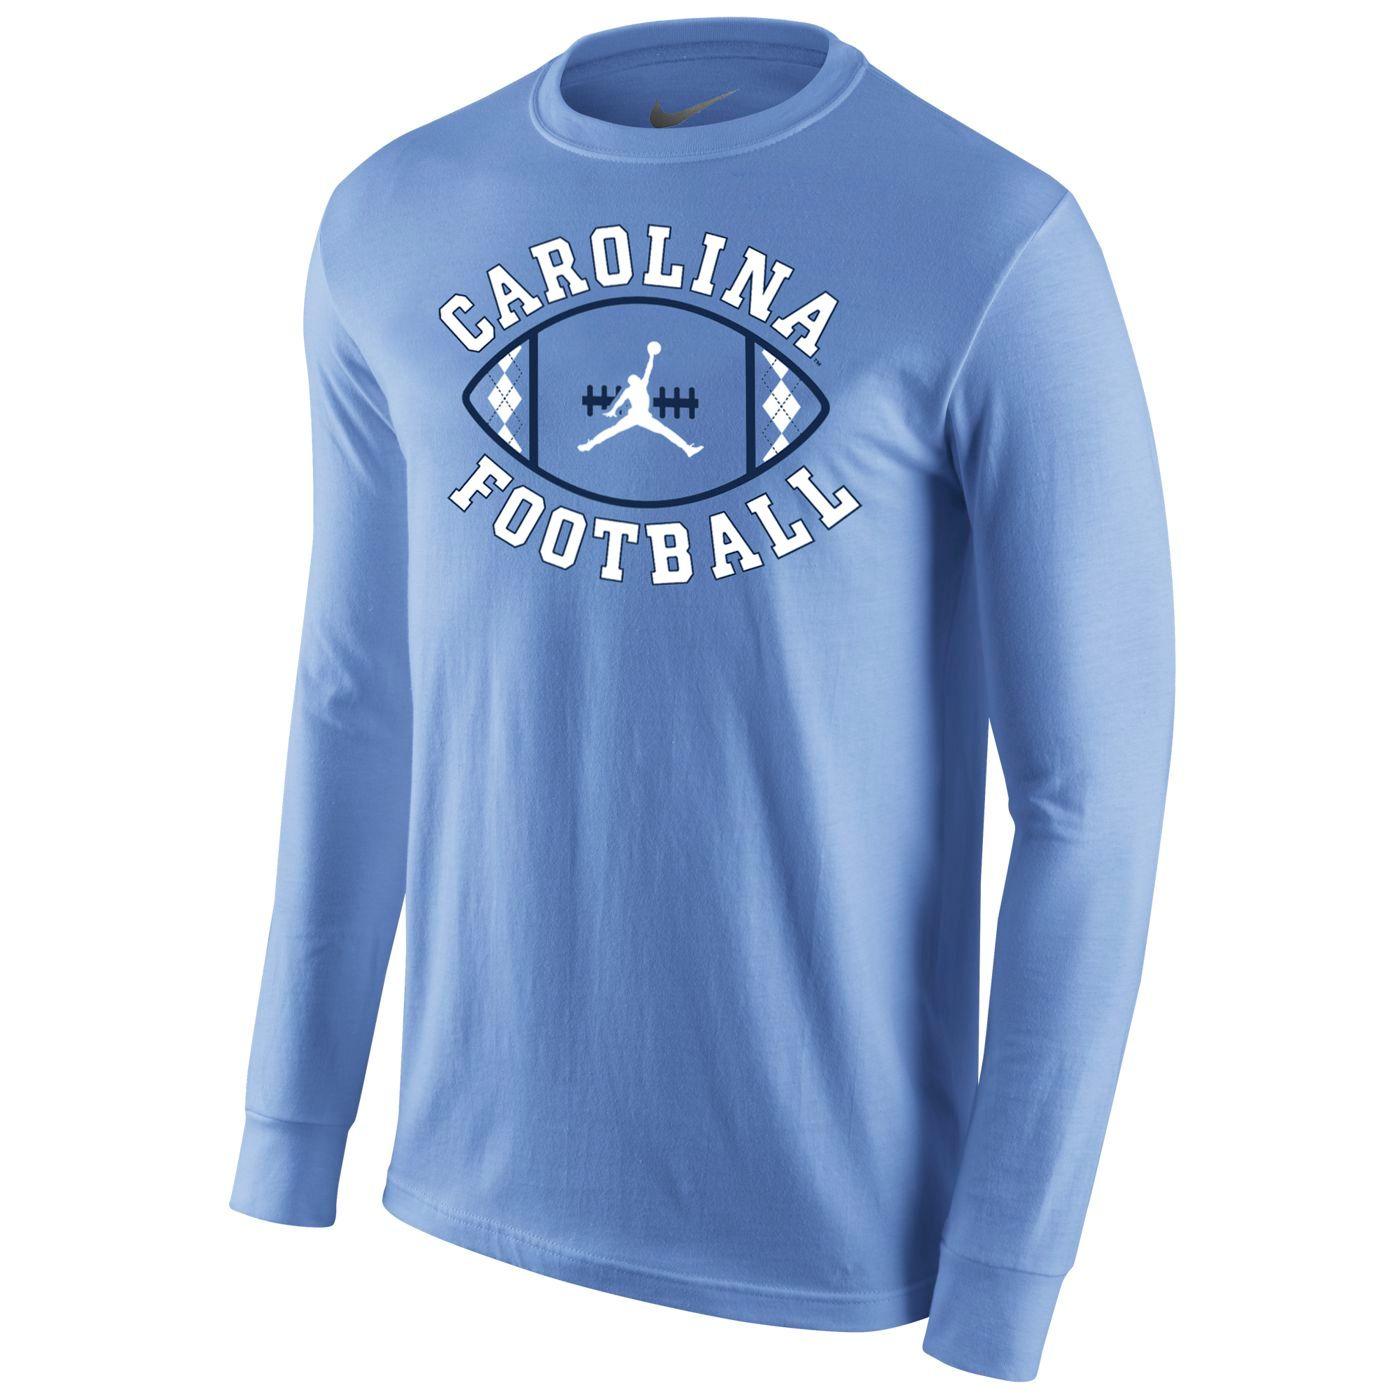 cd376b55639 Johnny T-shirt - North Carolina Tar Heels - Nike Long Sleeve Football  Activation Jumpman T (CB) by Nike